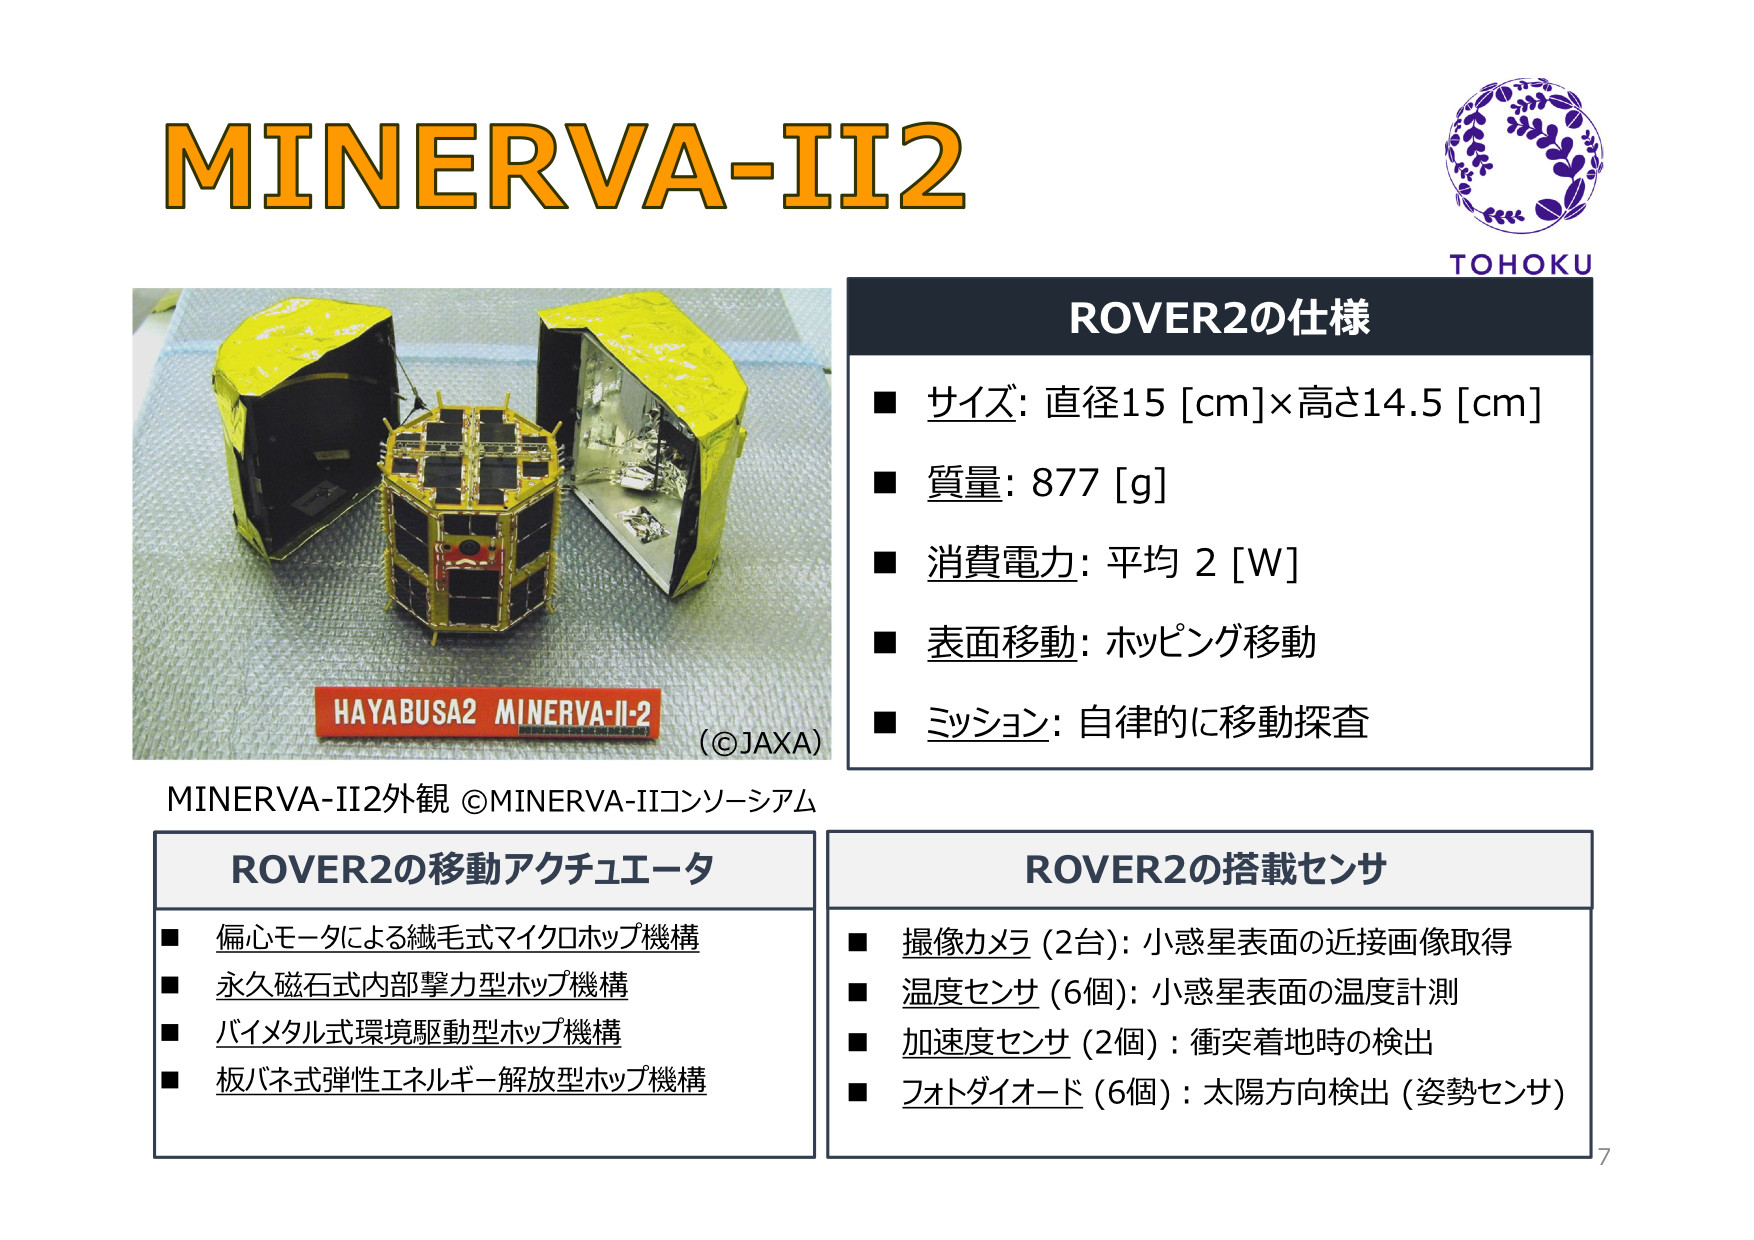 f:id:Imamura:20190924122717p:plain